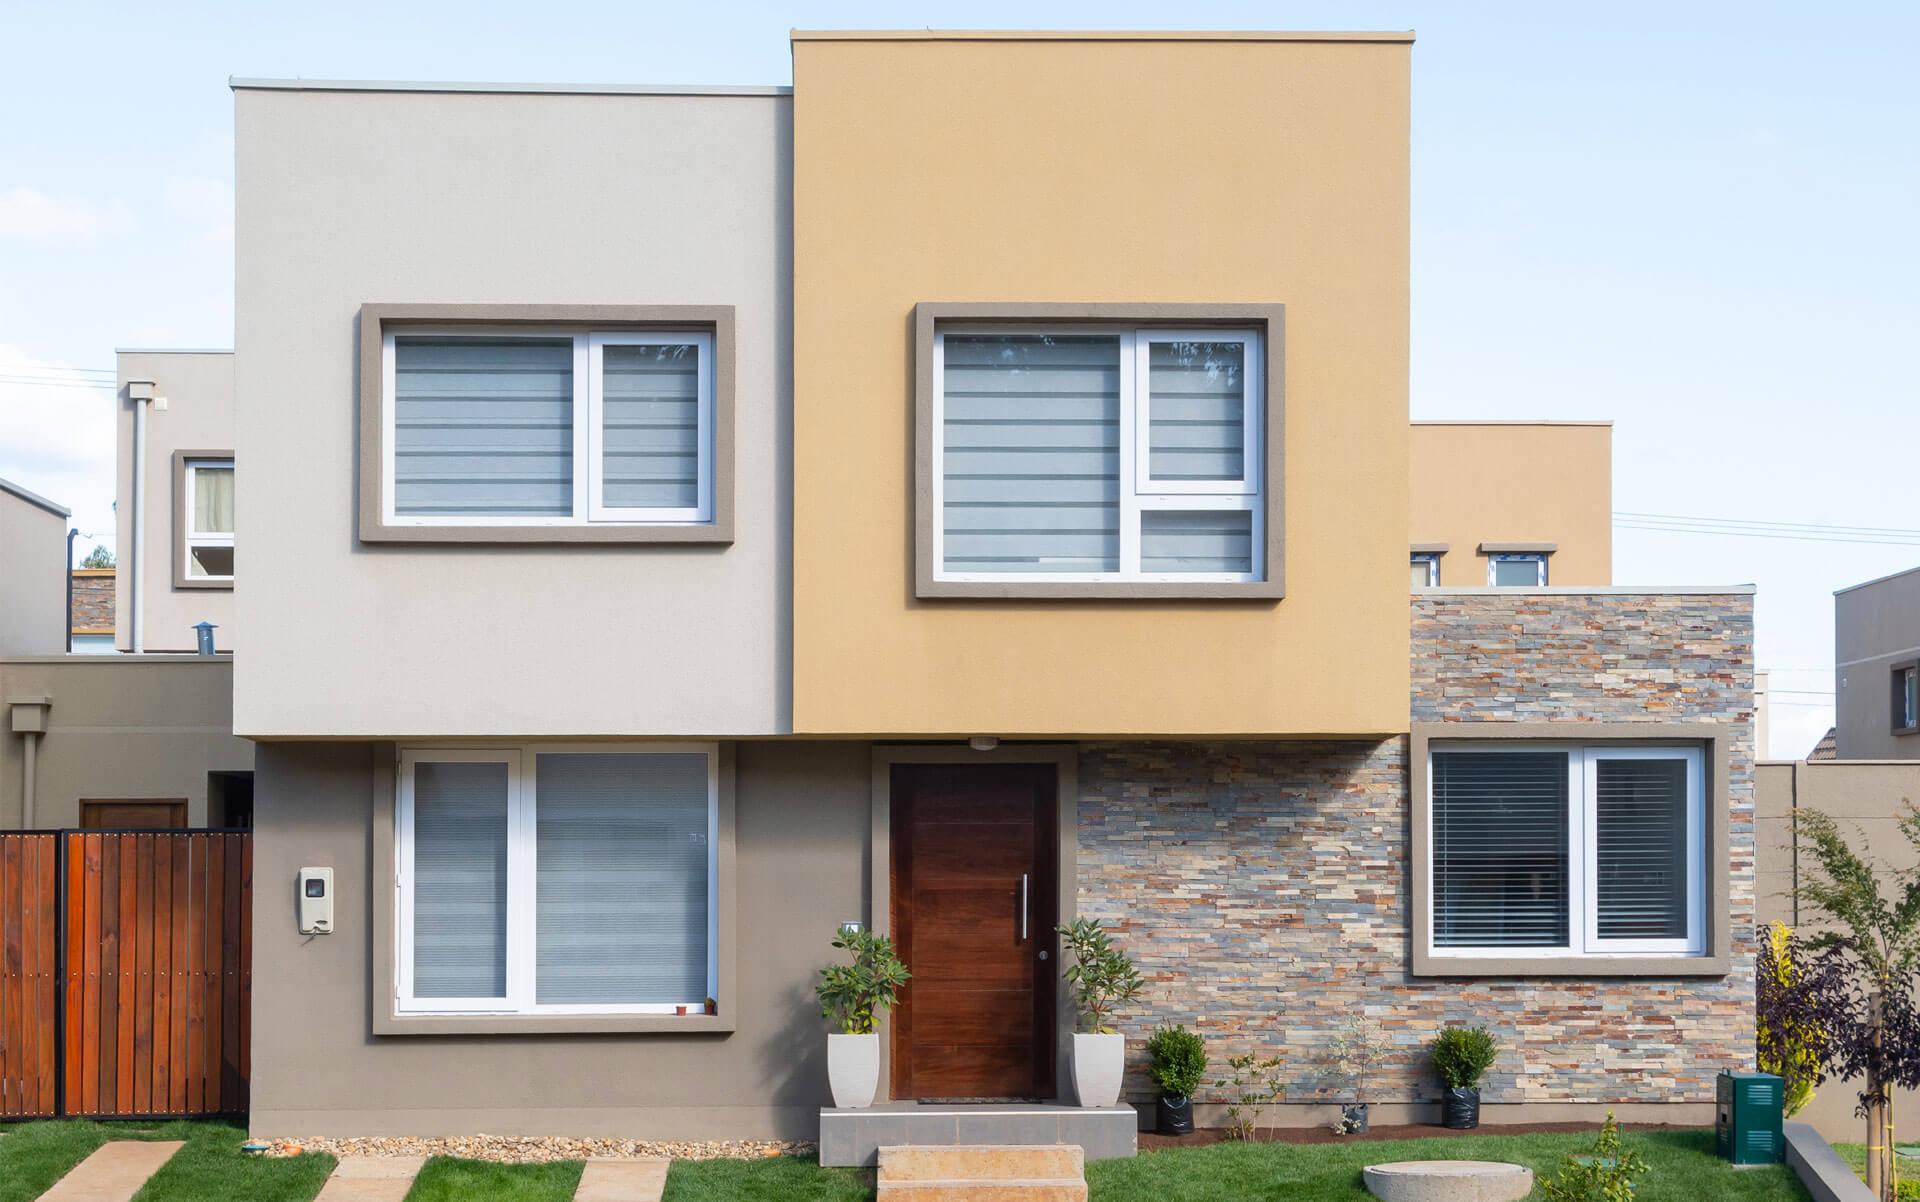 dubois-condominio-versalles-modelo-C